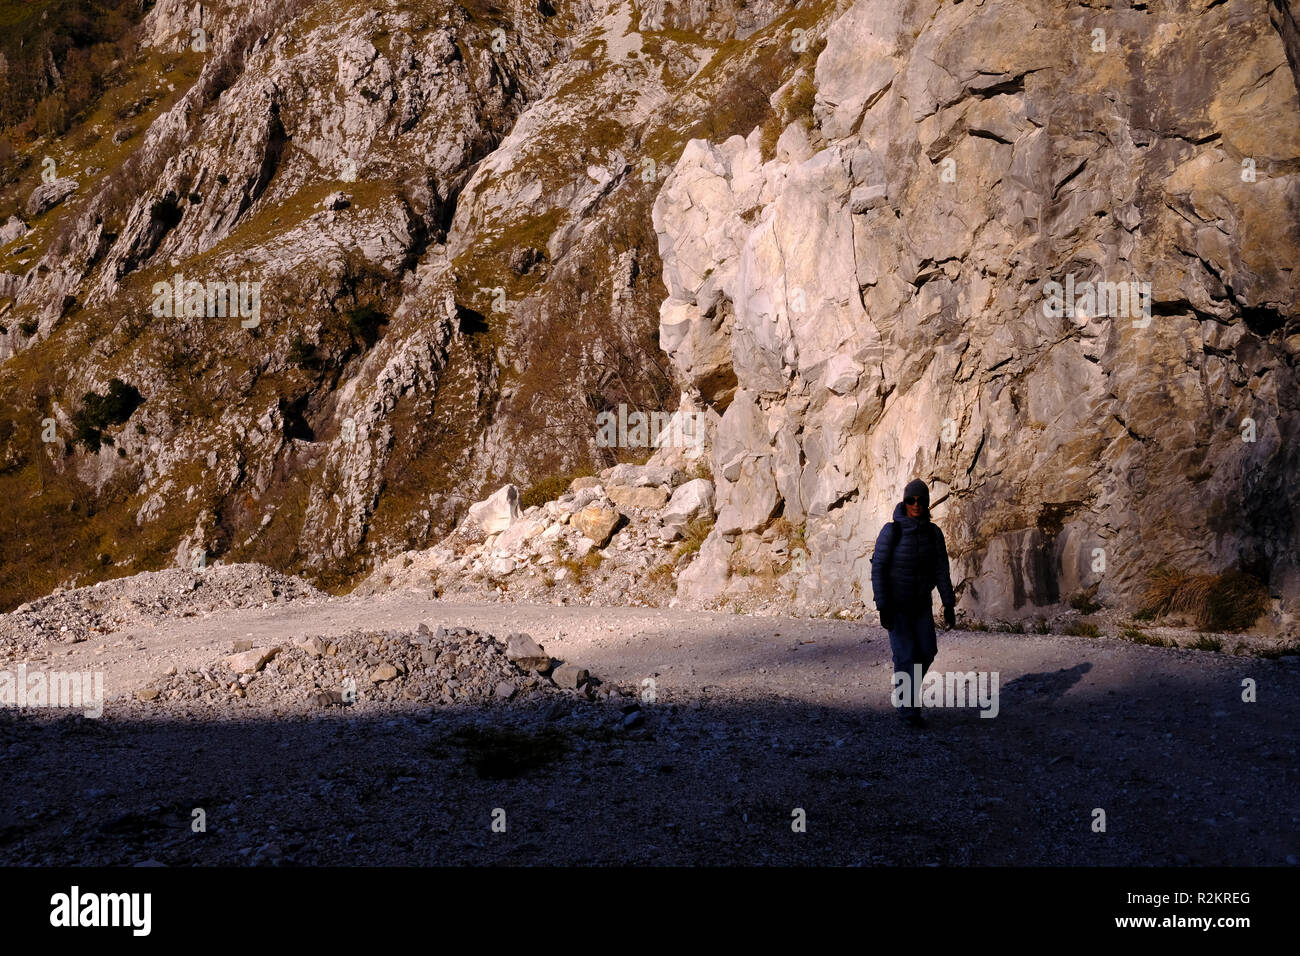 Unplugged: woman exploring nature, hiking on Tuscany mountains, breathtaking panorama (Italy). - Stock Image